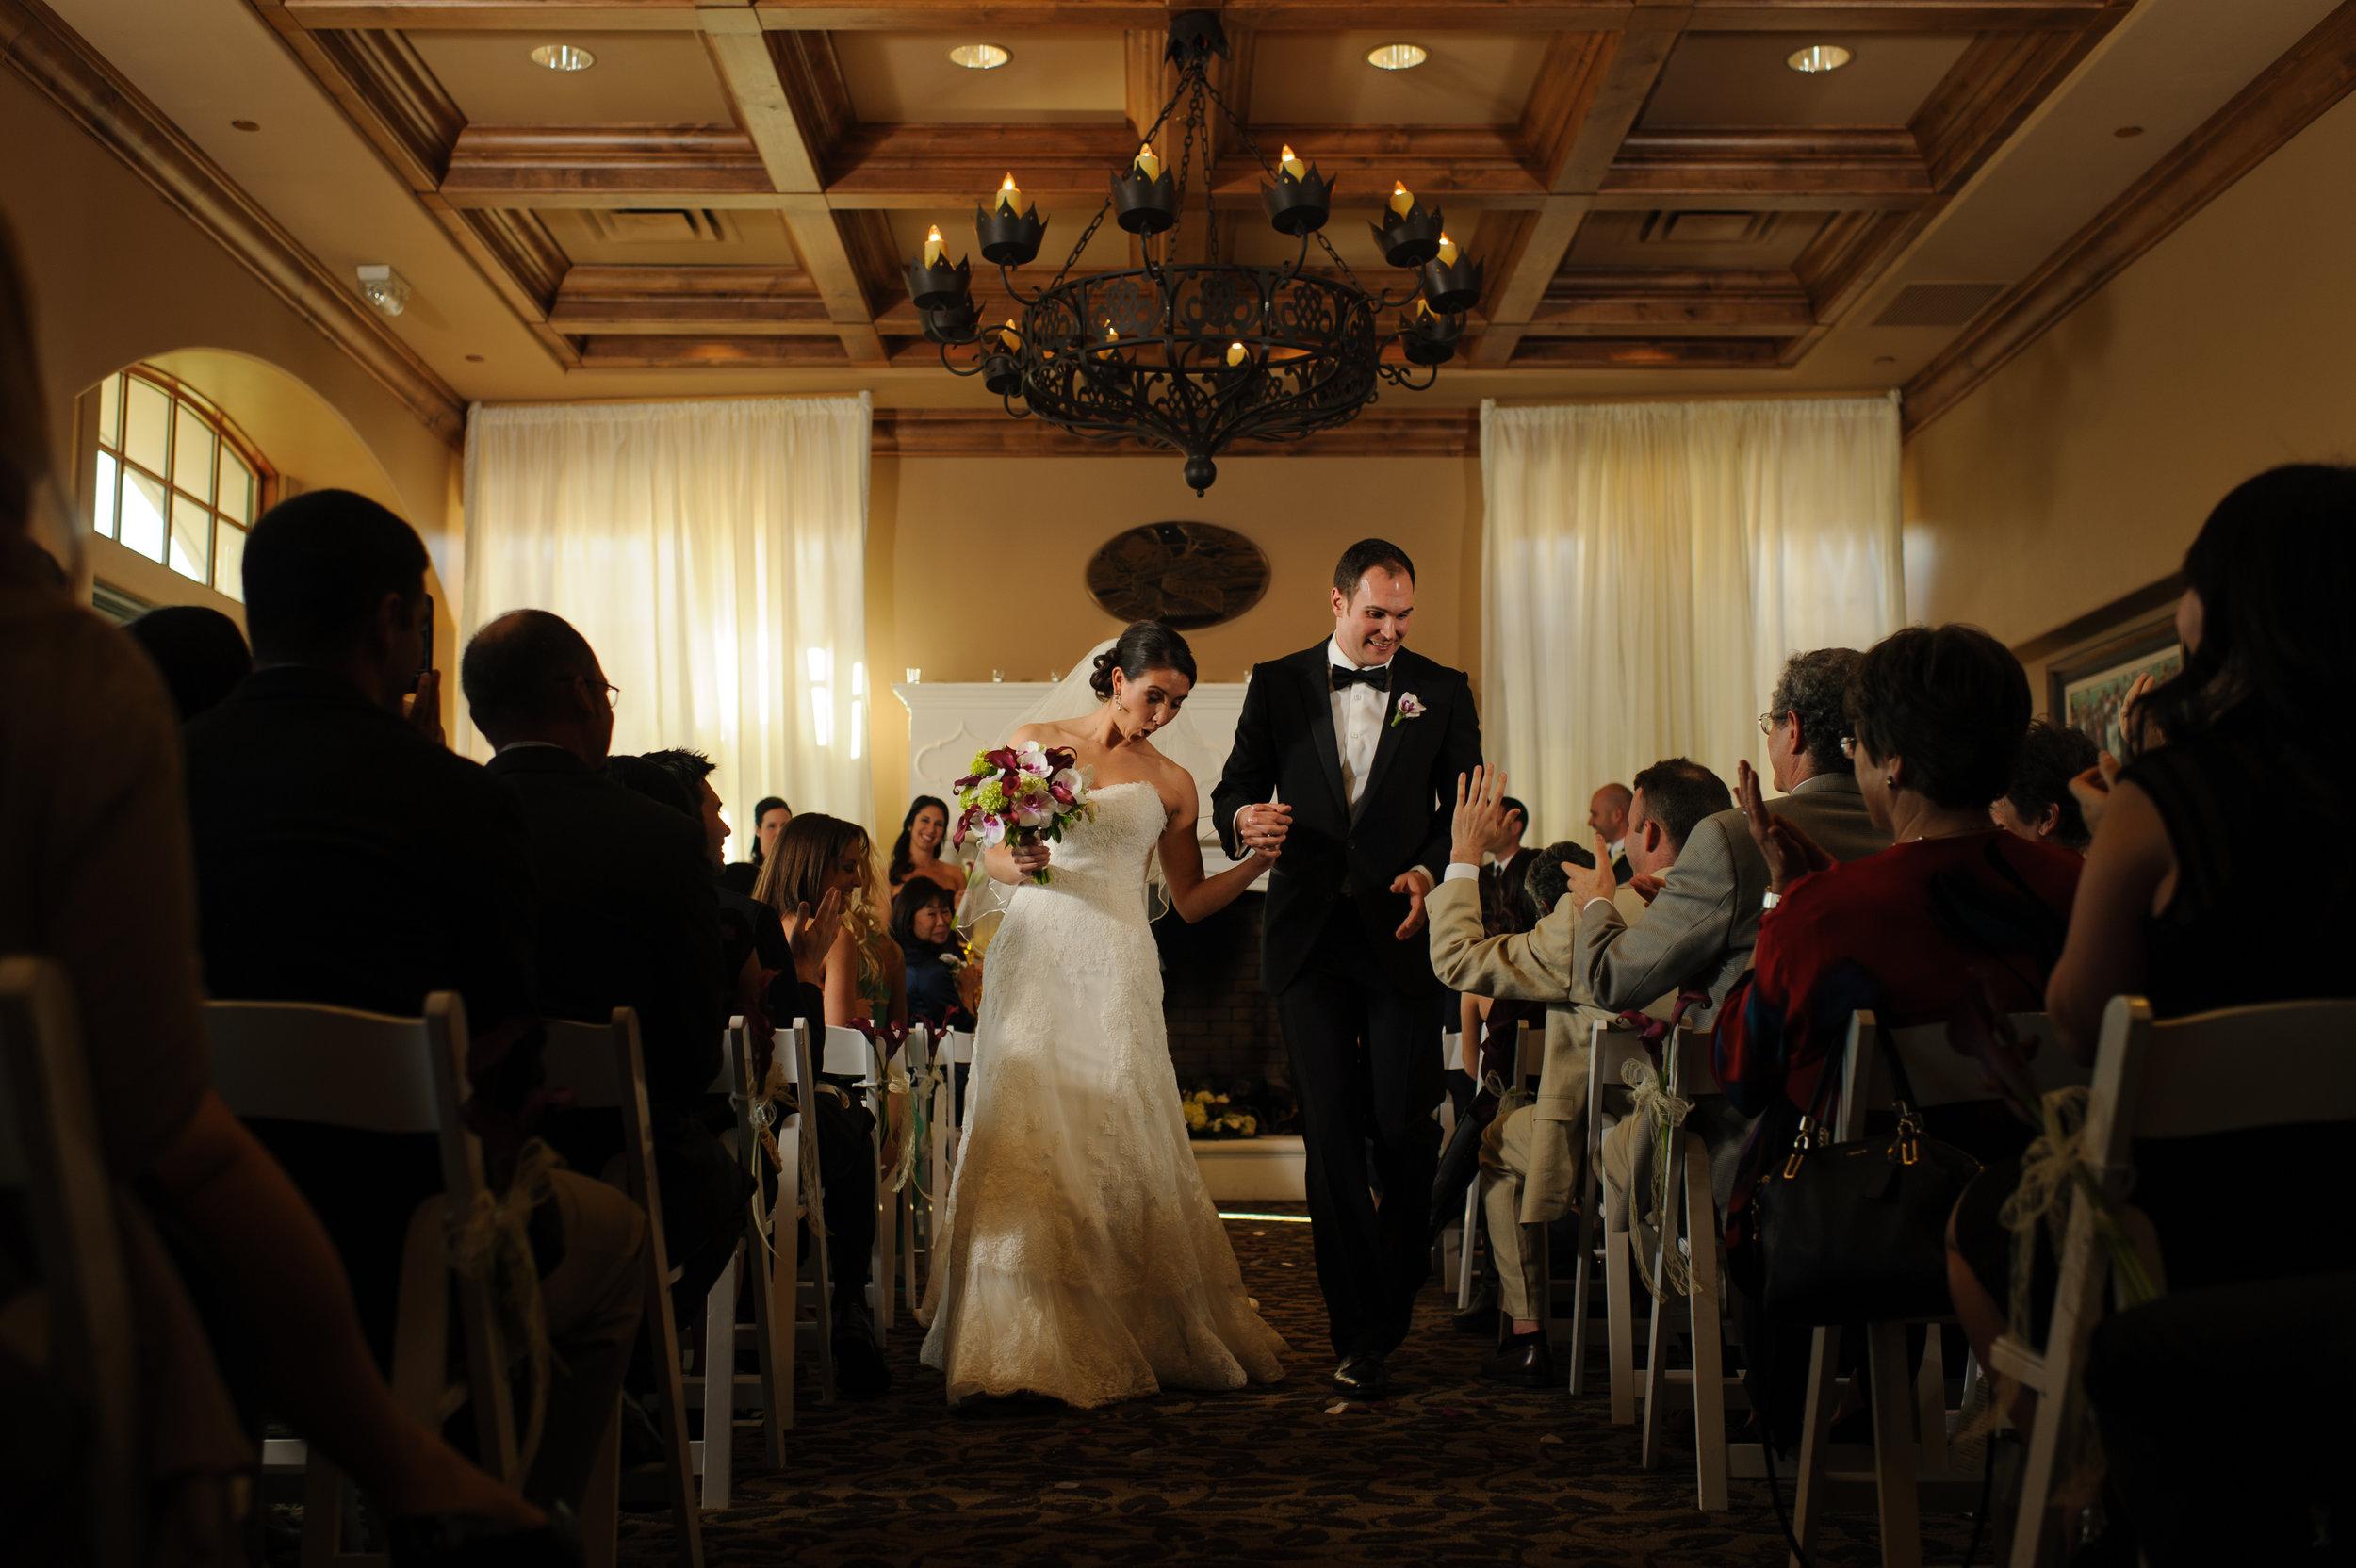 lindsey-jake-025-the-bridges-golf-course-san-ramon-wedding-photographer-katherine-nicole-photography.JPG